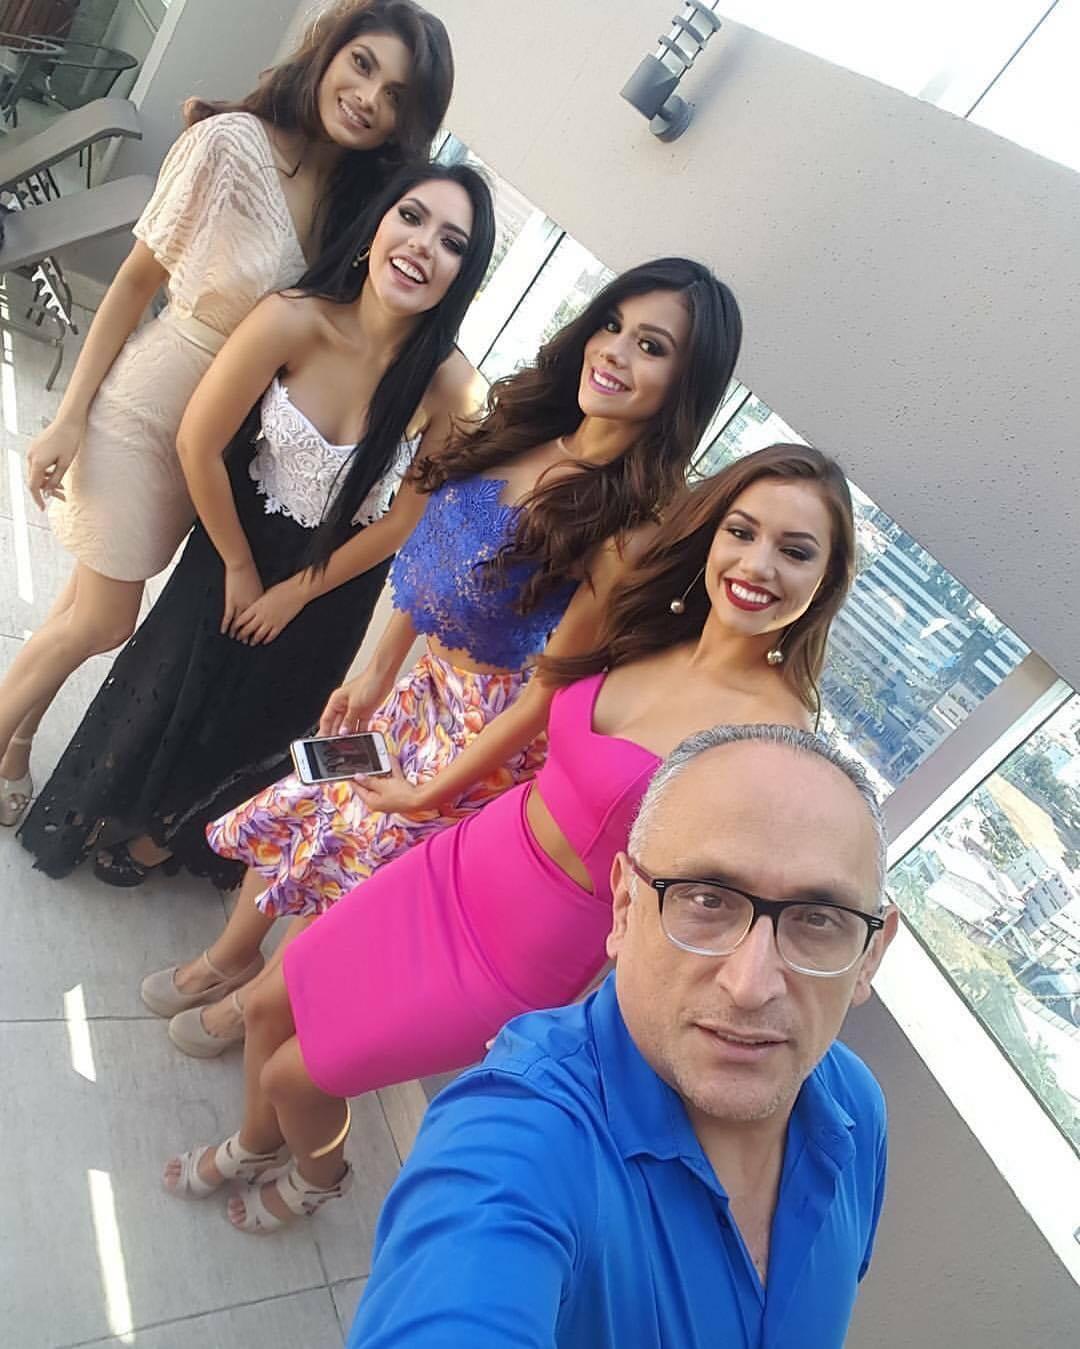 cynthia lizette duque garcia, top 5 de miss continentes unidos 2016. - Página 2 Zvx6donk